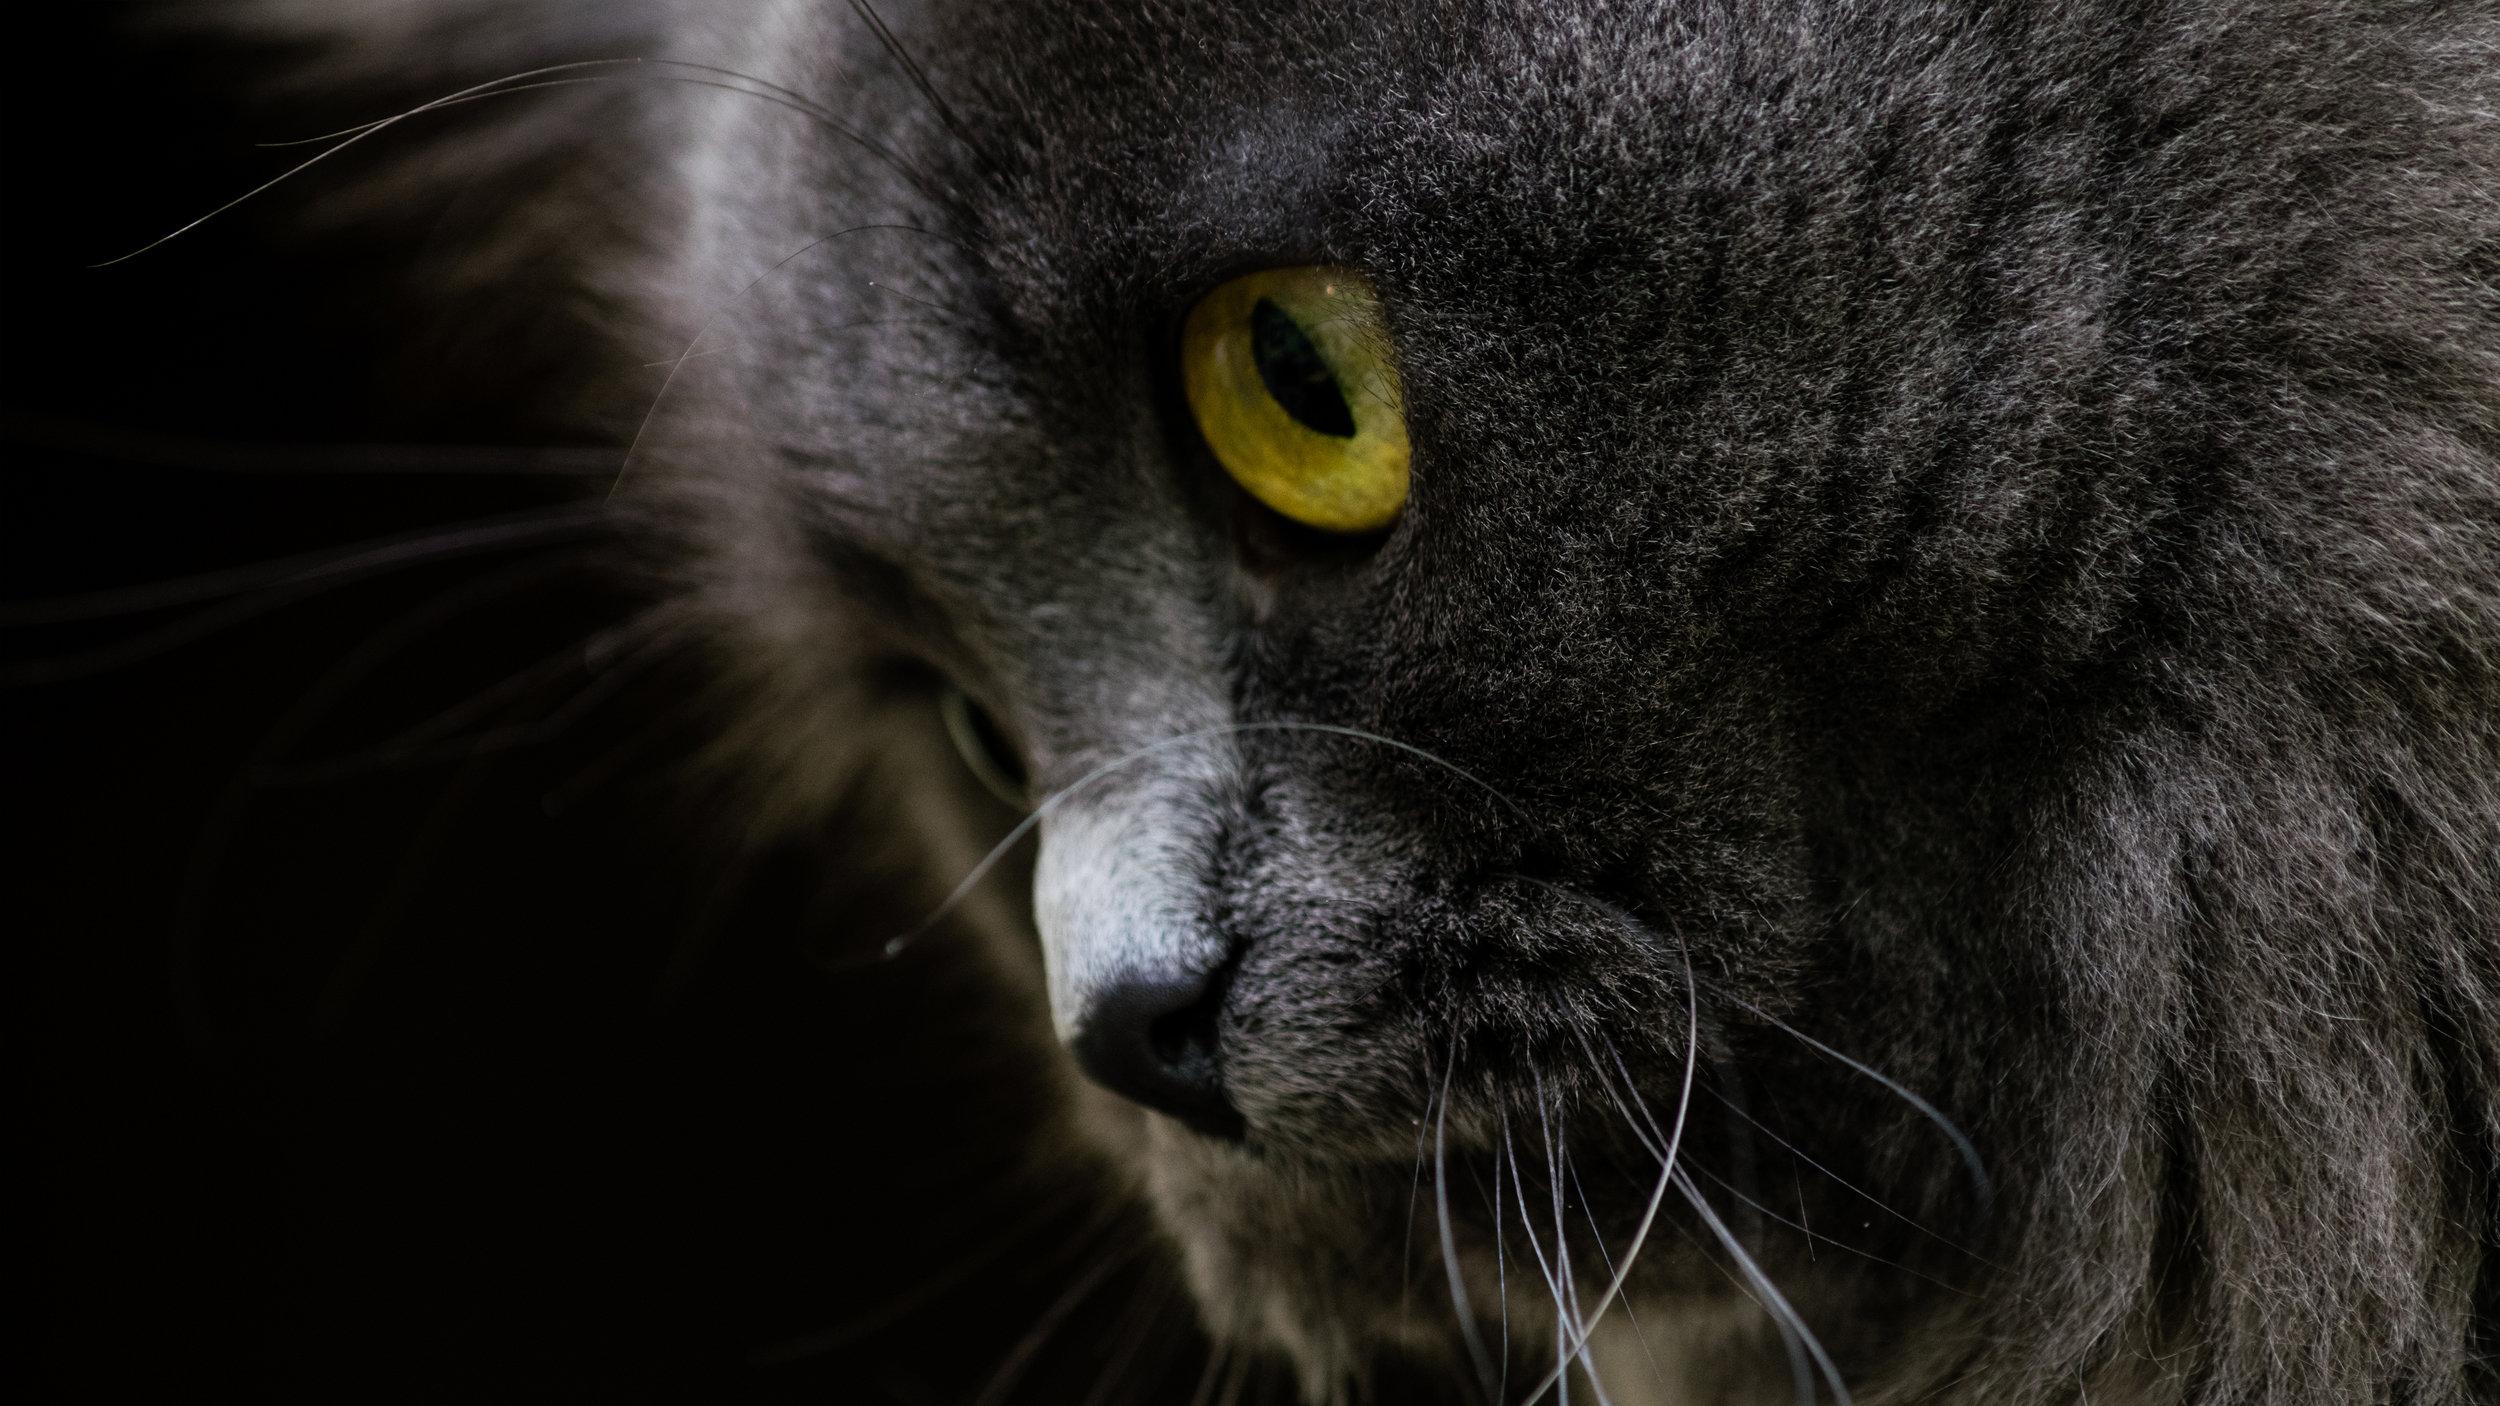 18291291785_c42833123e_o_cat1.jpg